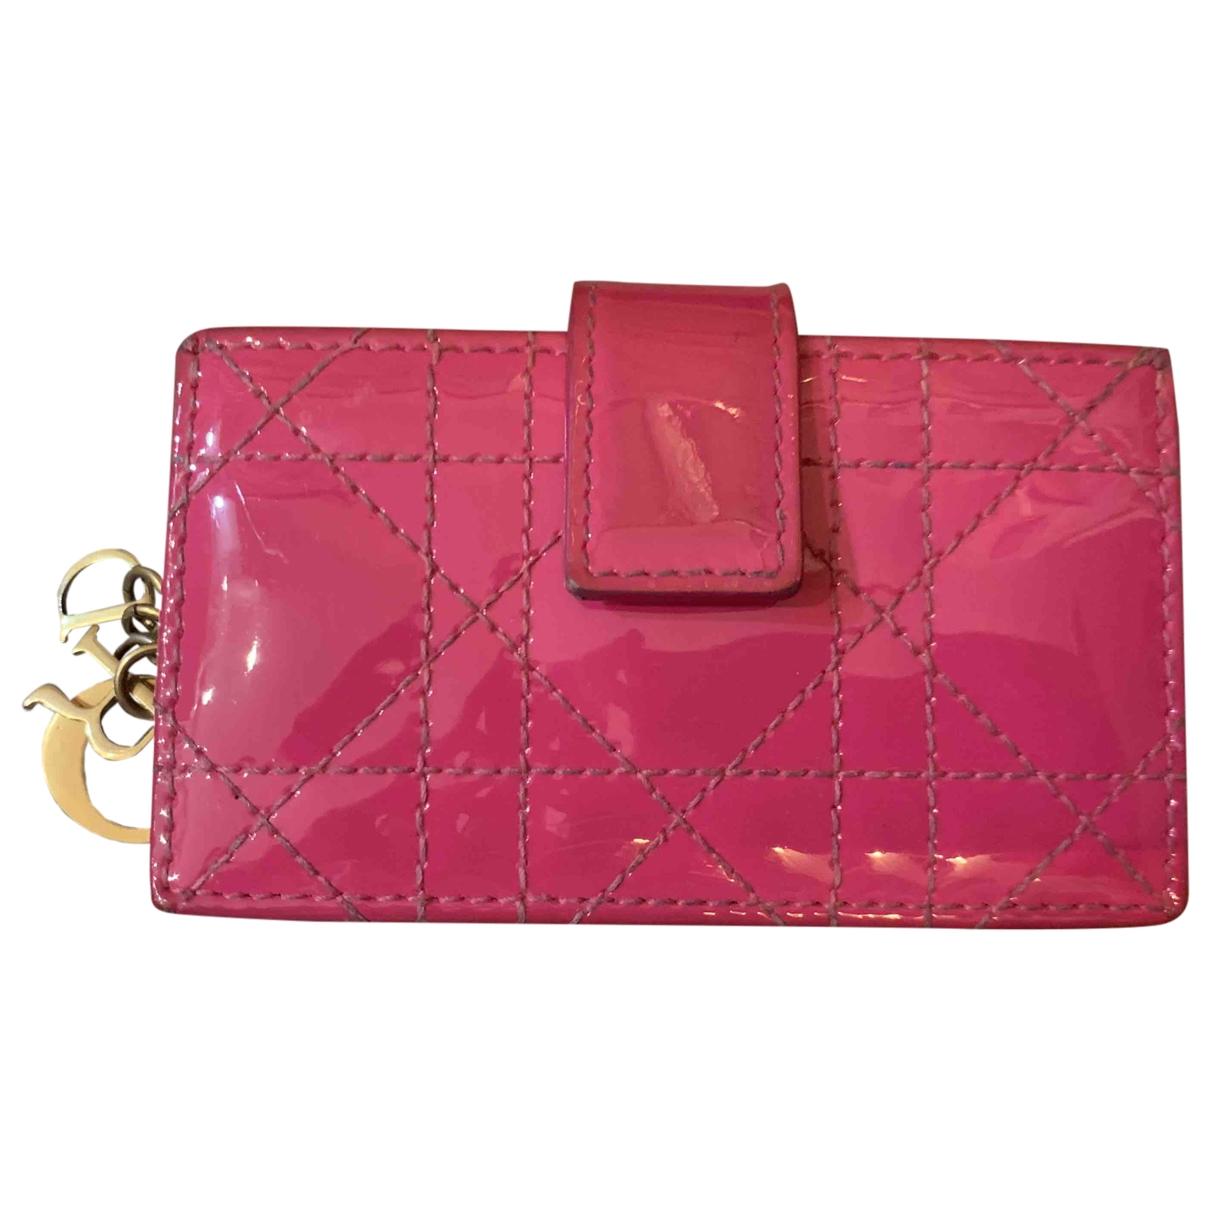 Dior - Petite maroquinerie   pour femme en cuir verni - rose